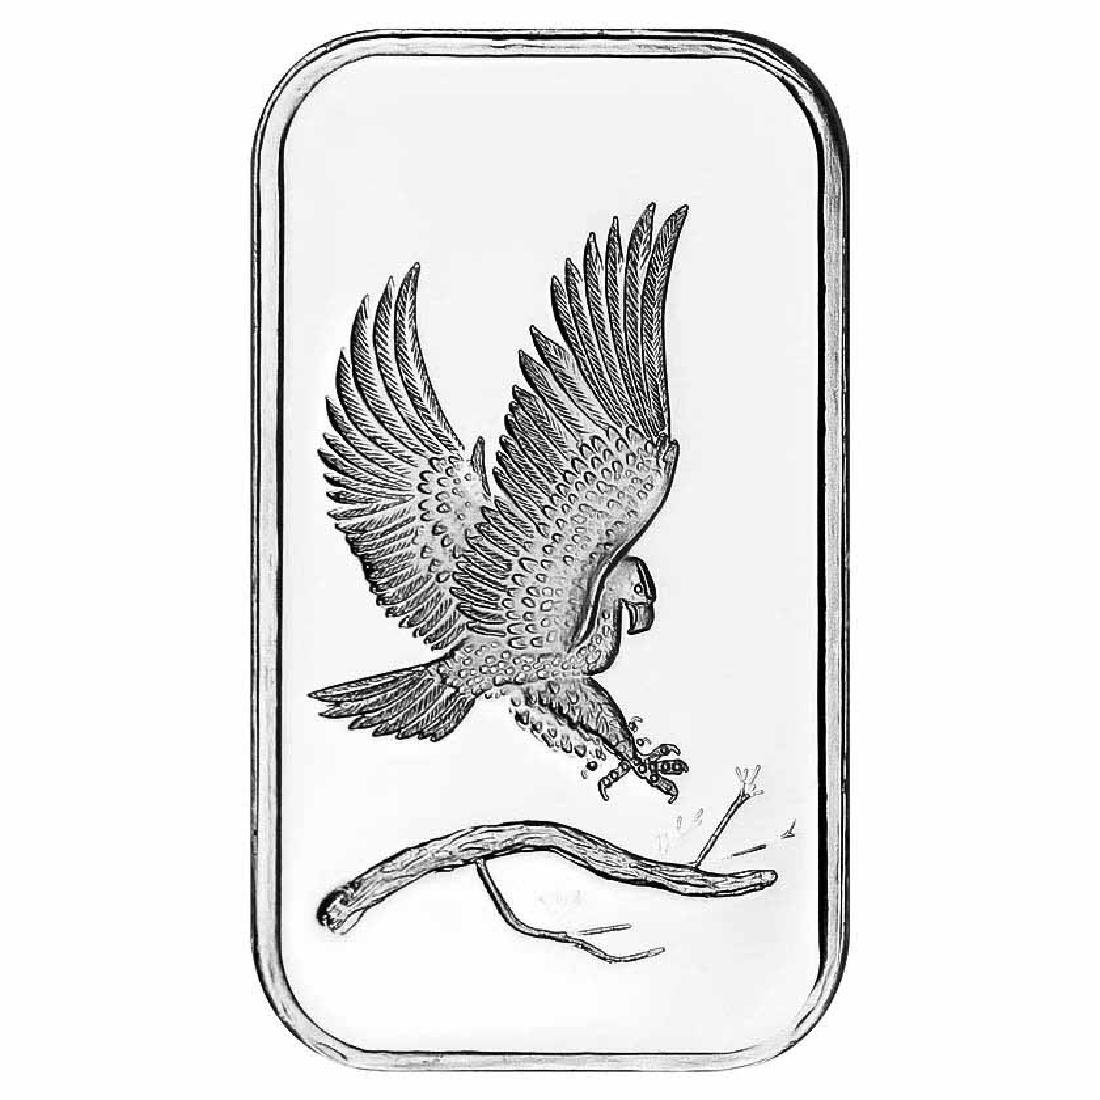 SilverTowne 1 oz Silver Bar - Eagle Design